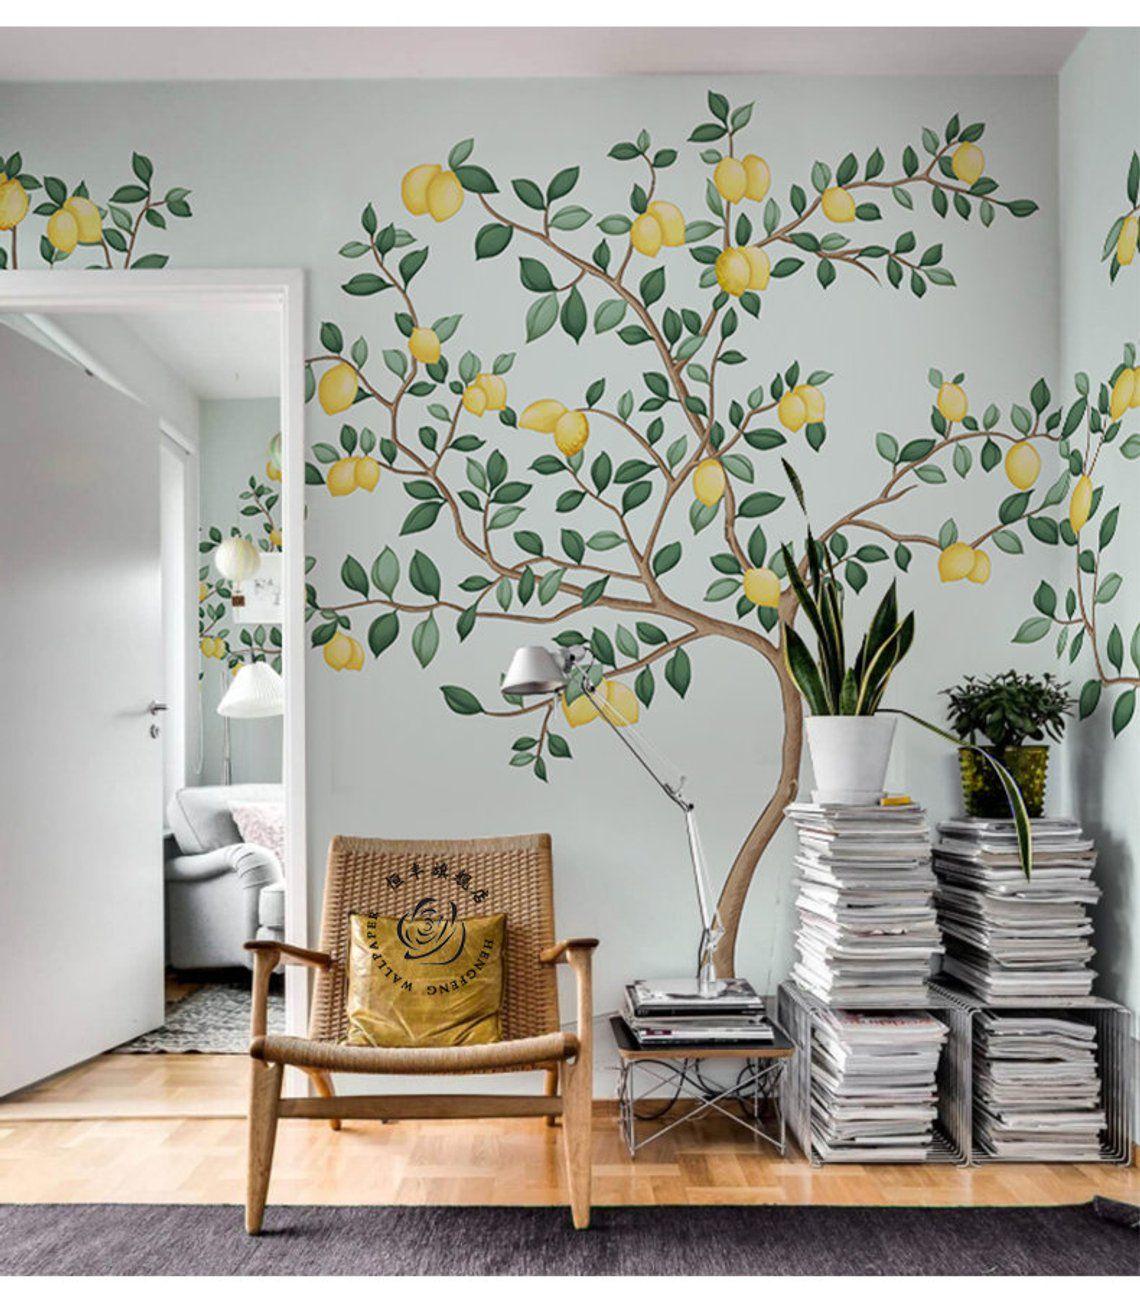 Abstract Watercolor Hand Painted Lemon Trees Wallpaper Wall